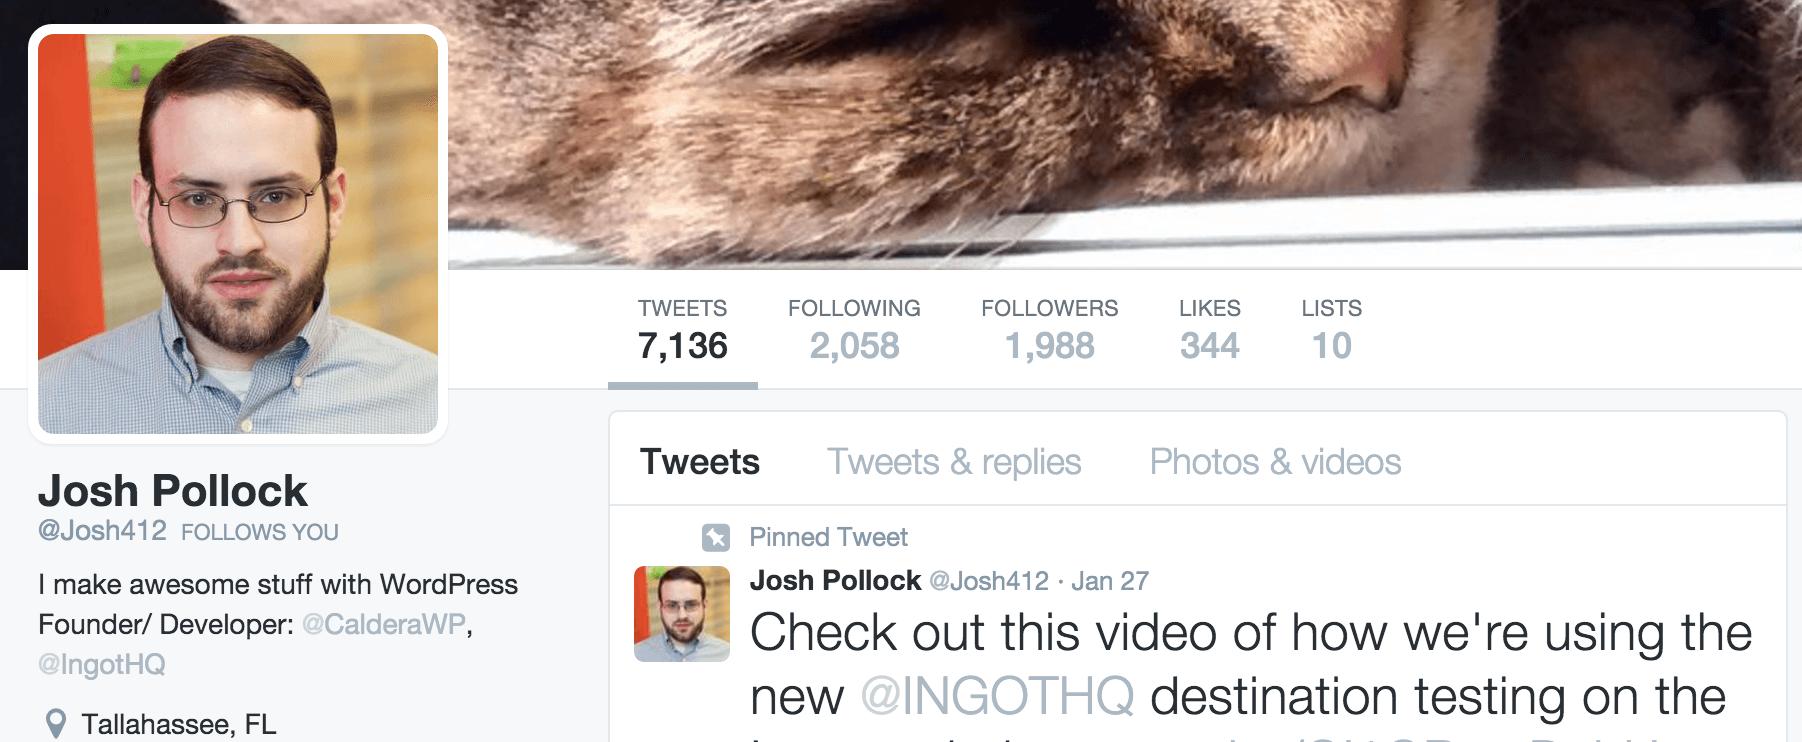 Josh Pollock